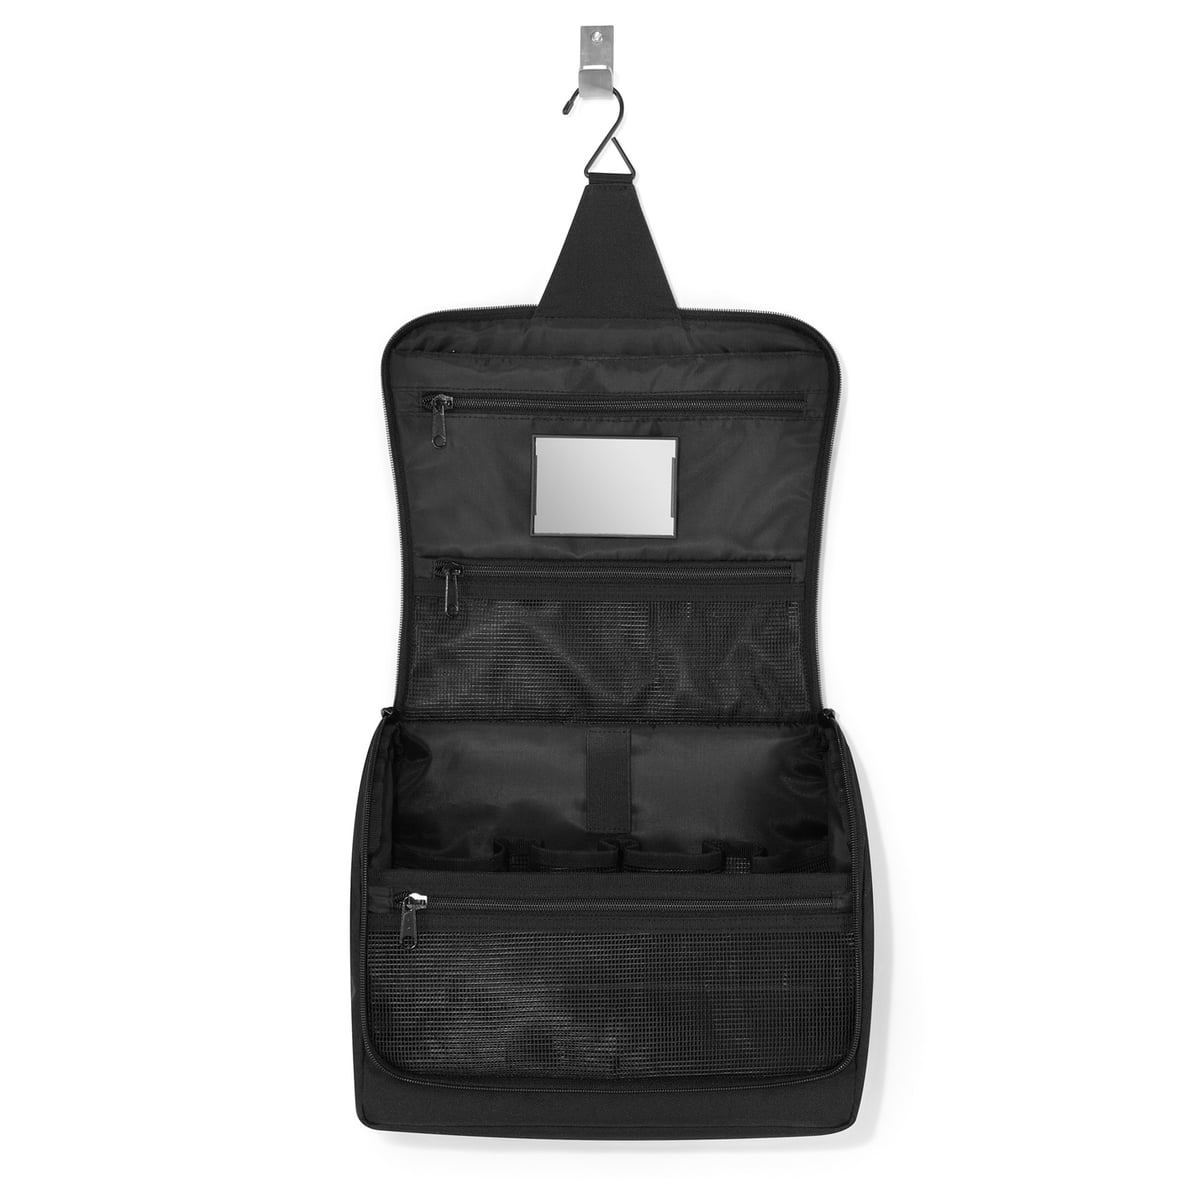 Toiletbag xl by reisenthel connox shop for Connox com